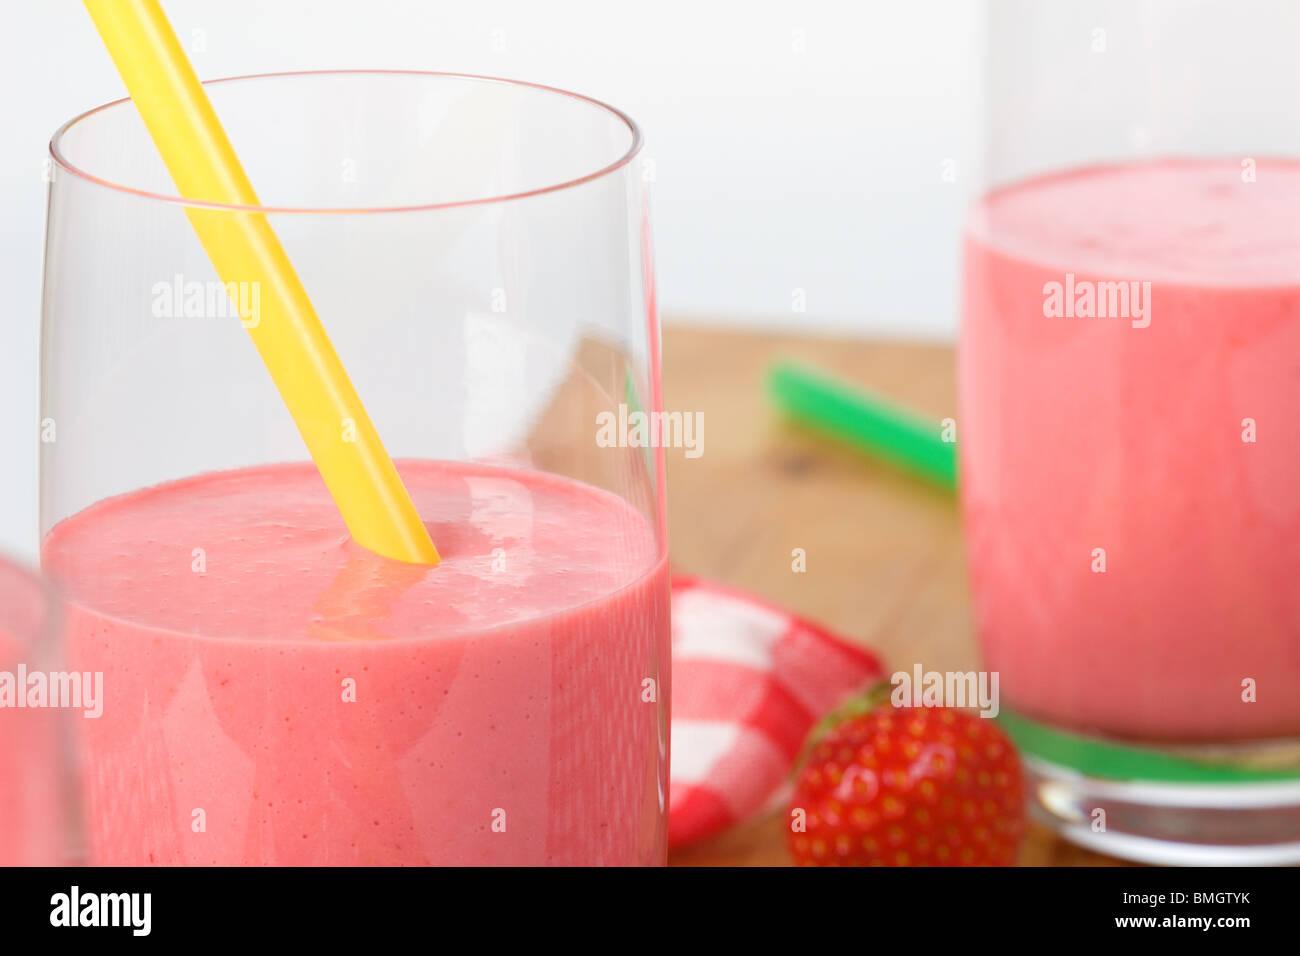 Two milkshakes - Stock Image